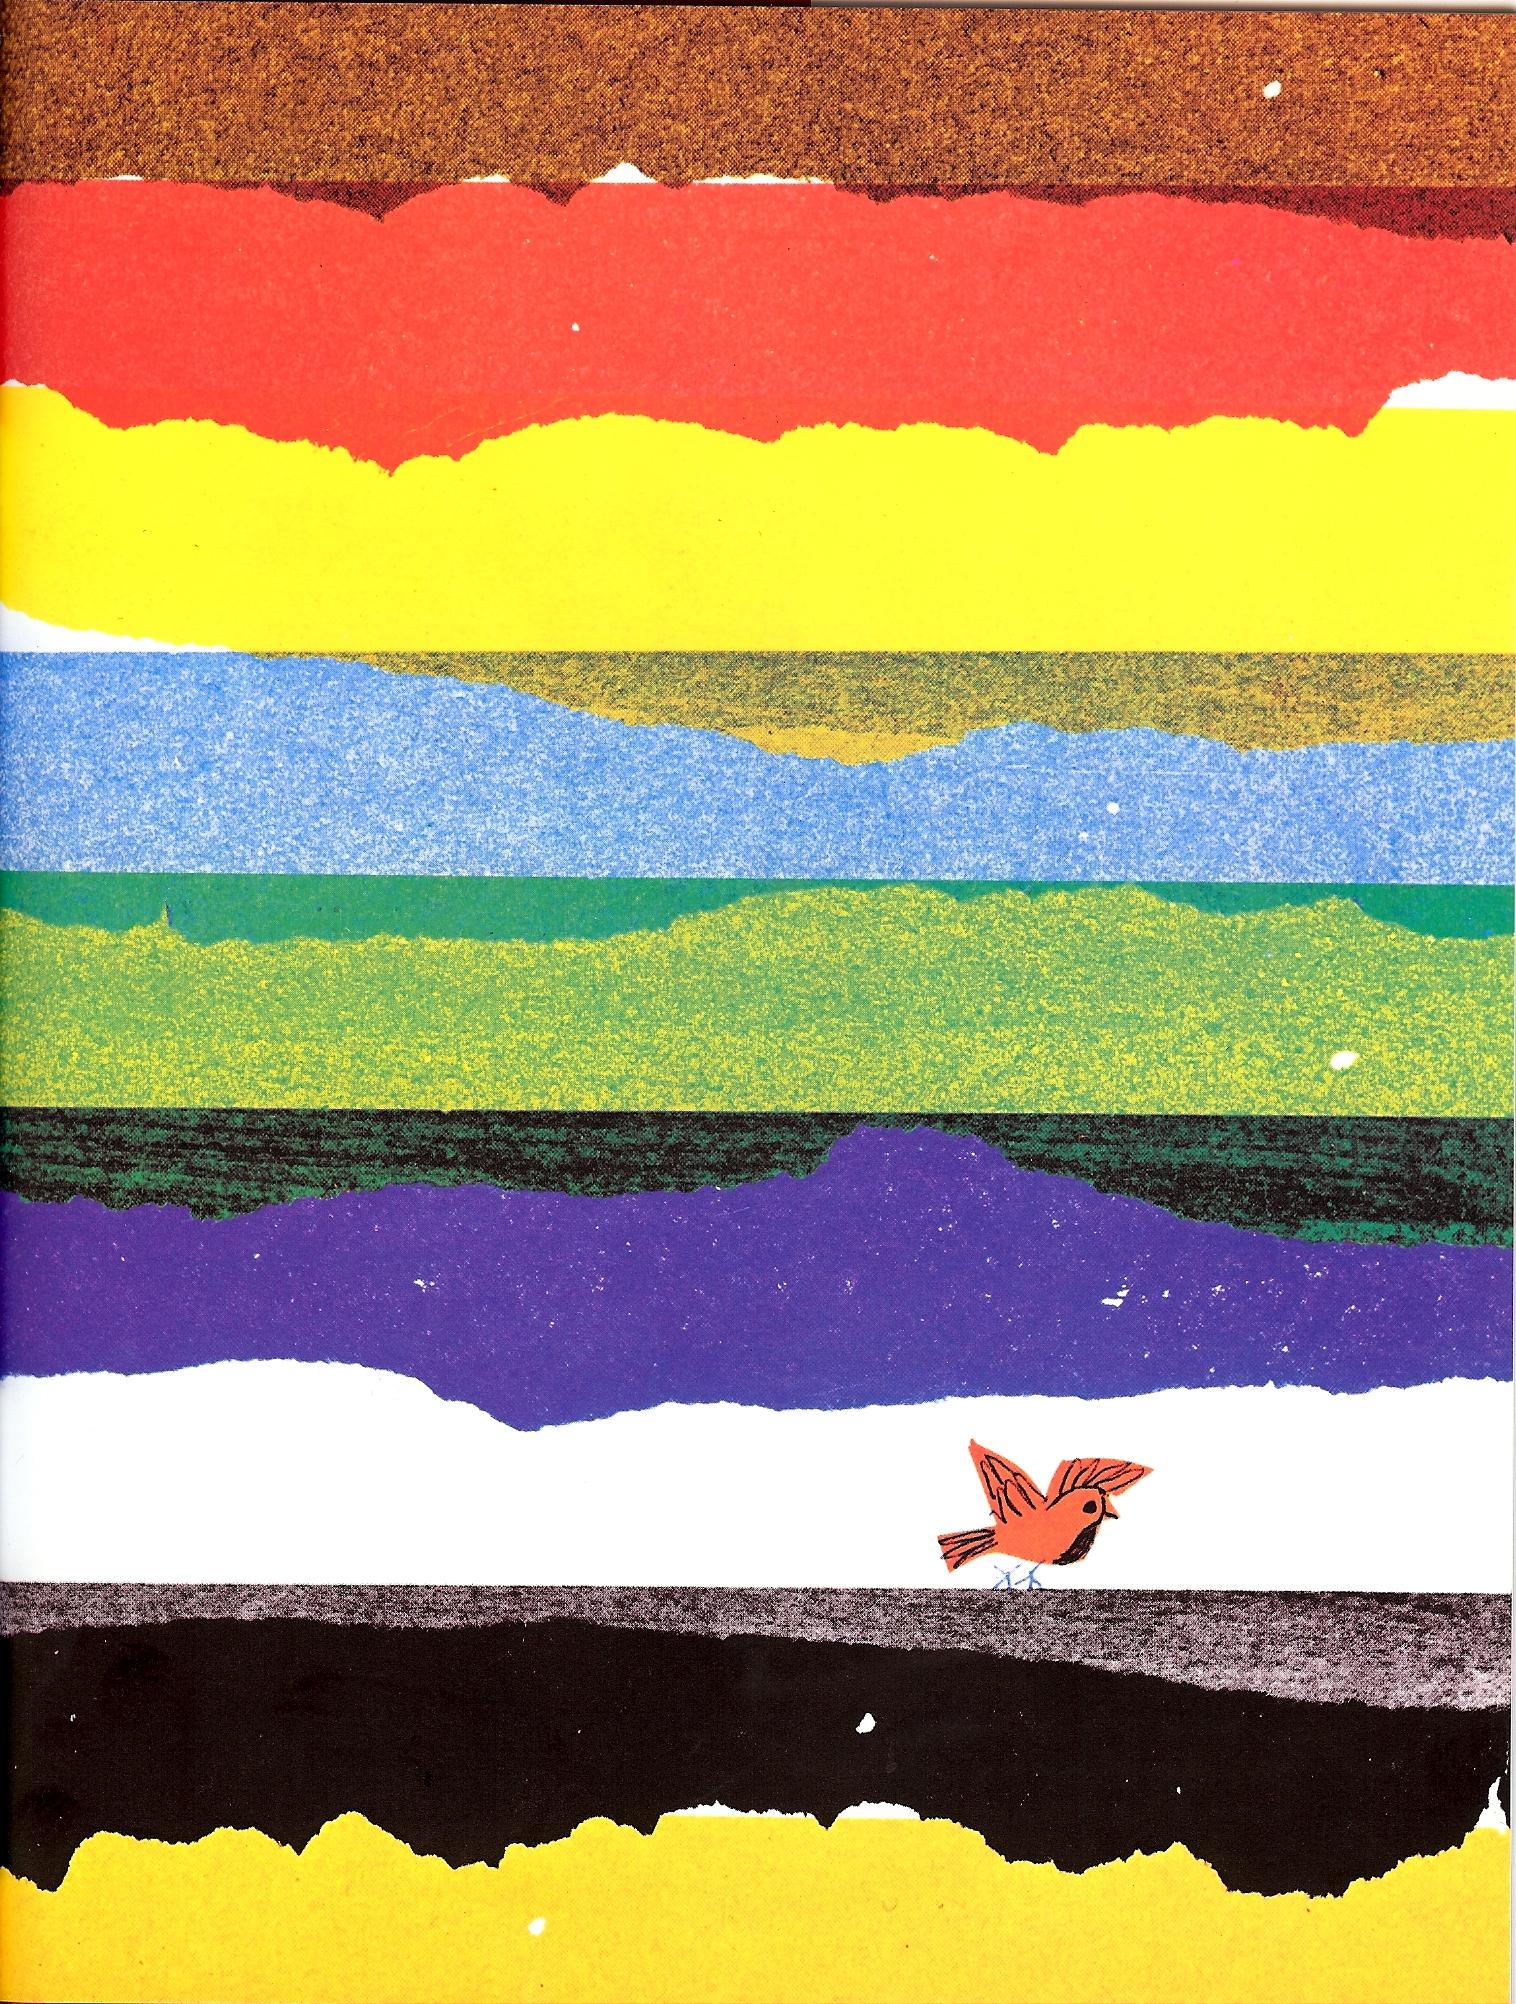 Children S Book Cover Design Inspiration ~ Children s books as design inspiration going on a book hunt